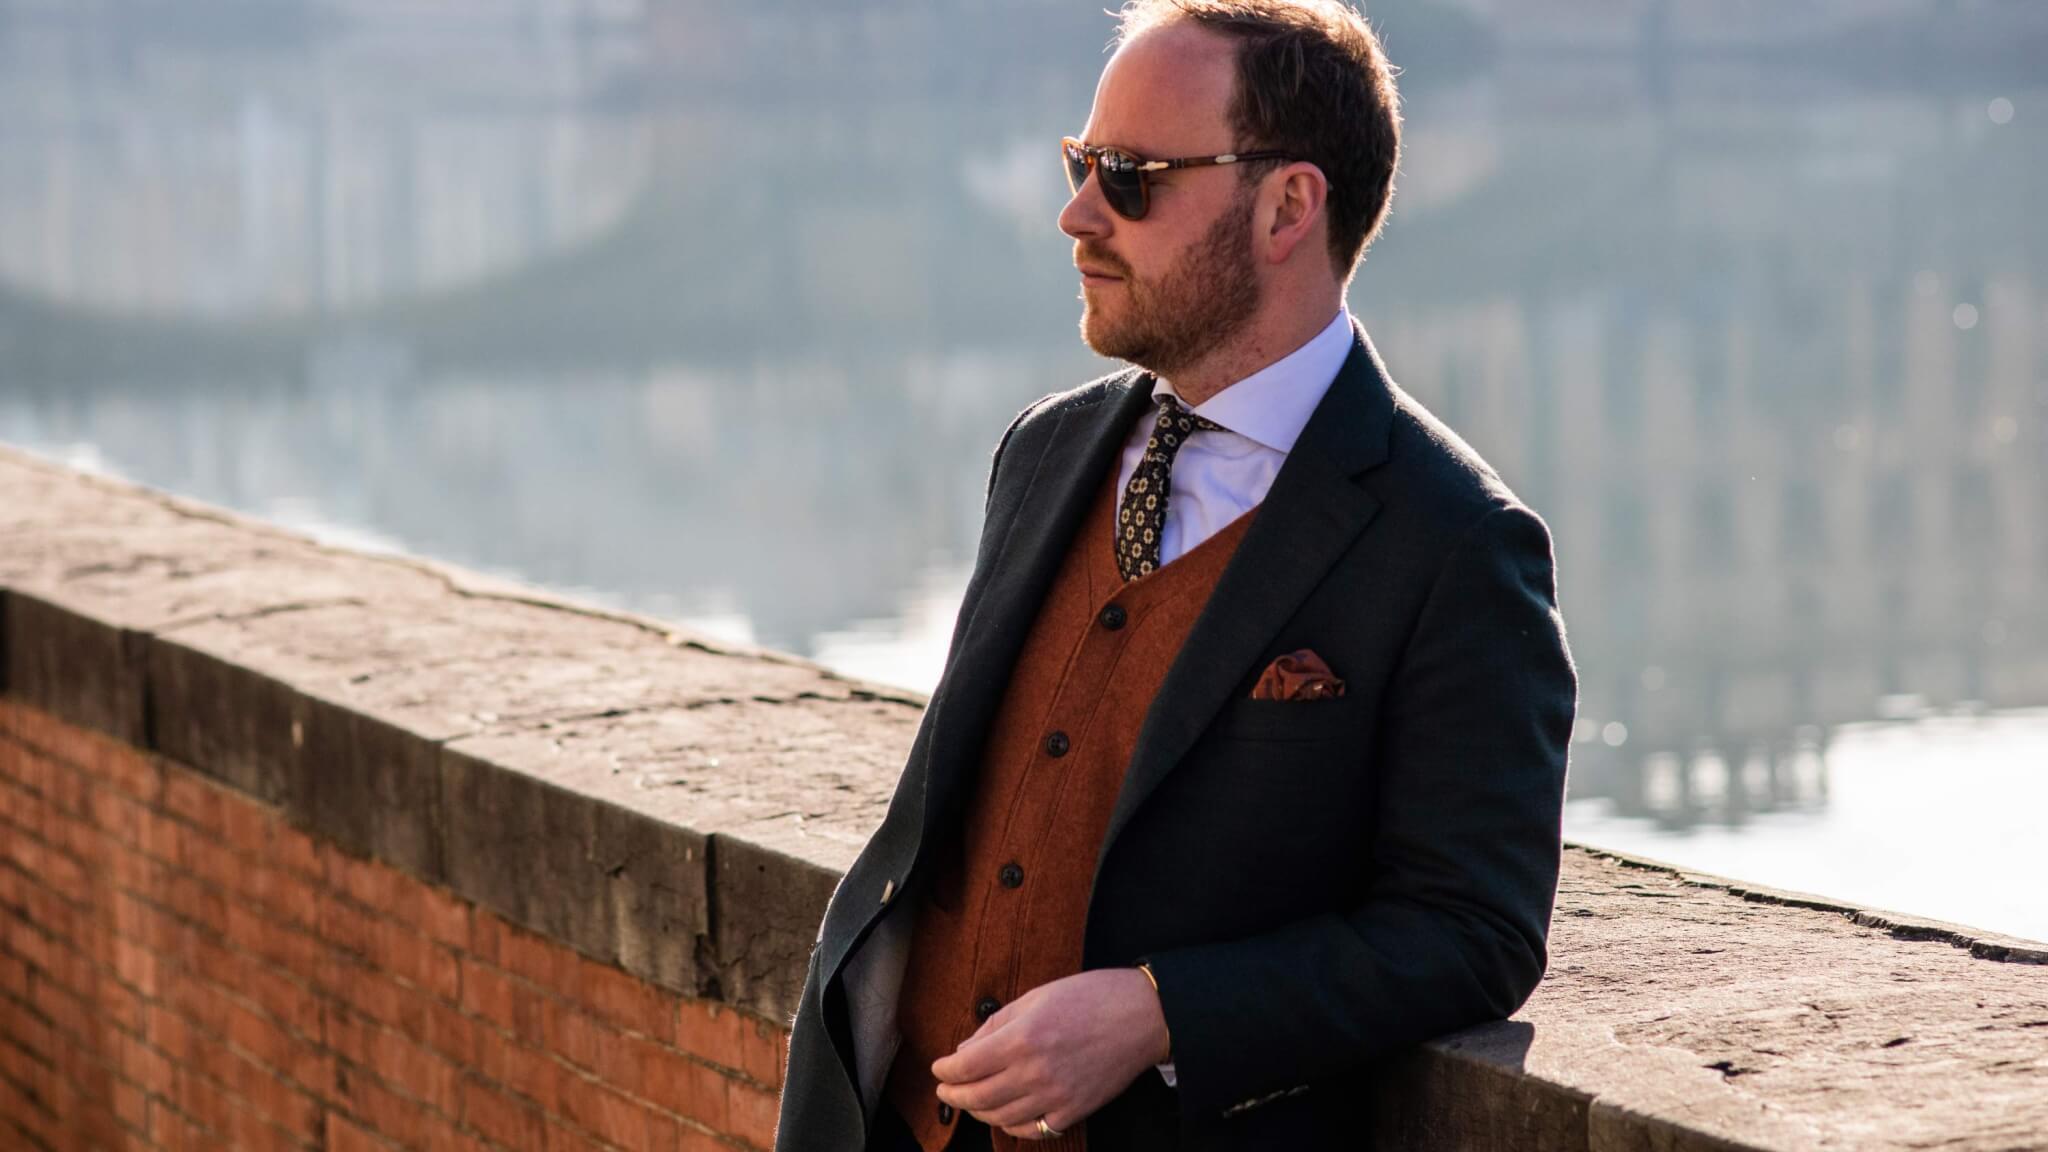 Bespoke Waistcoat & Jacket